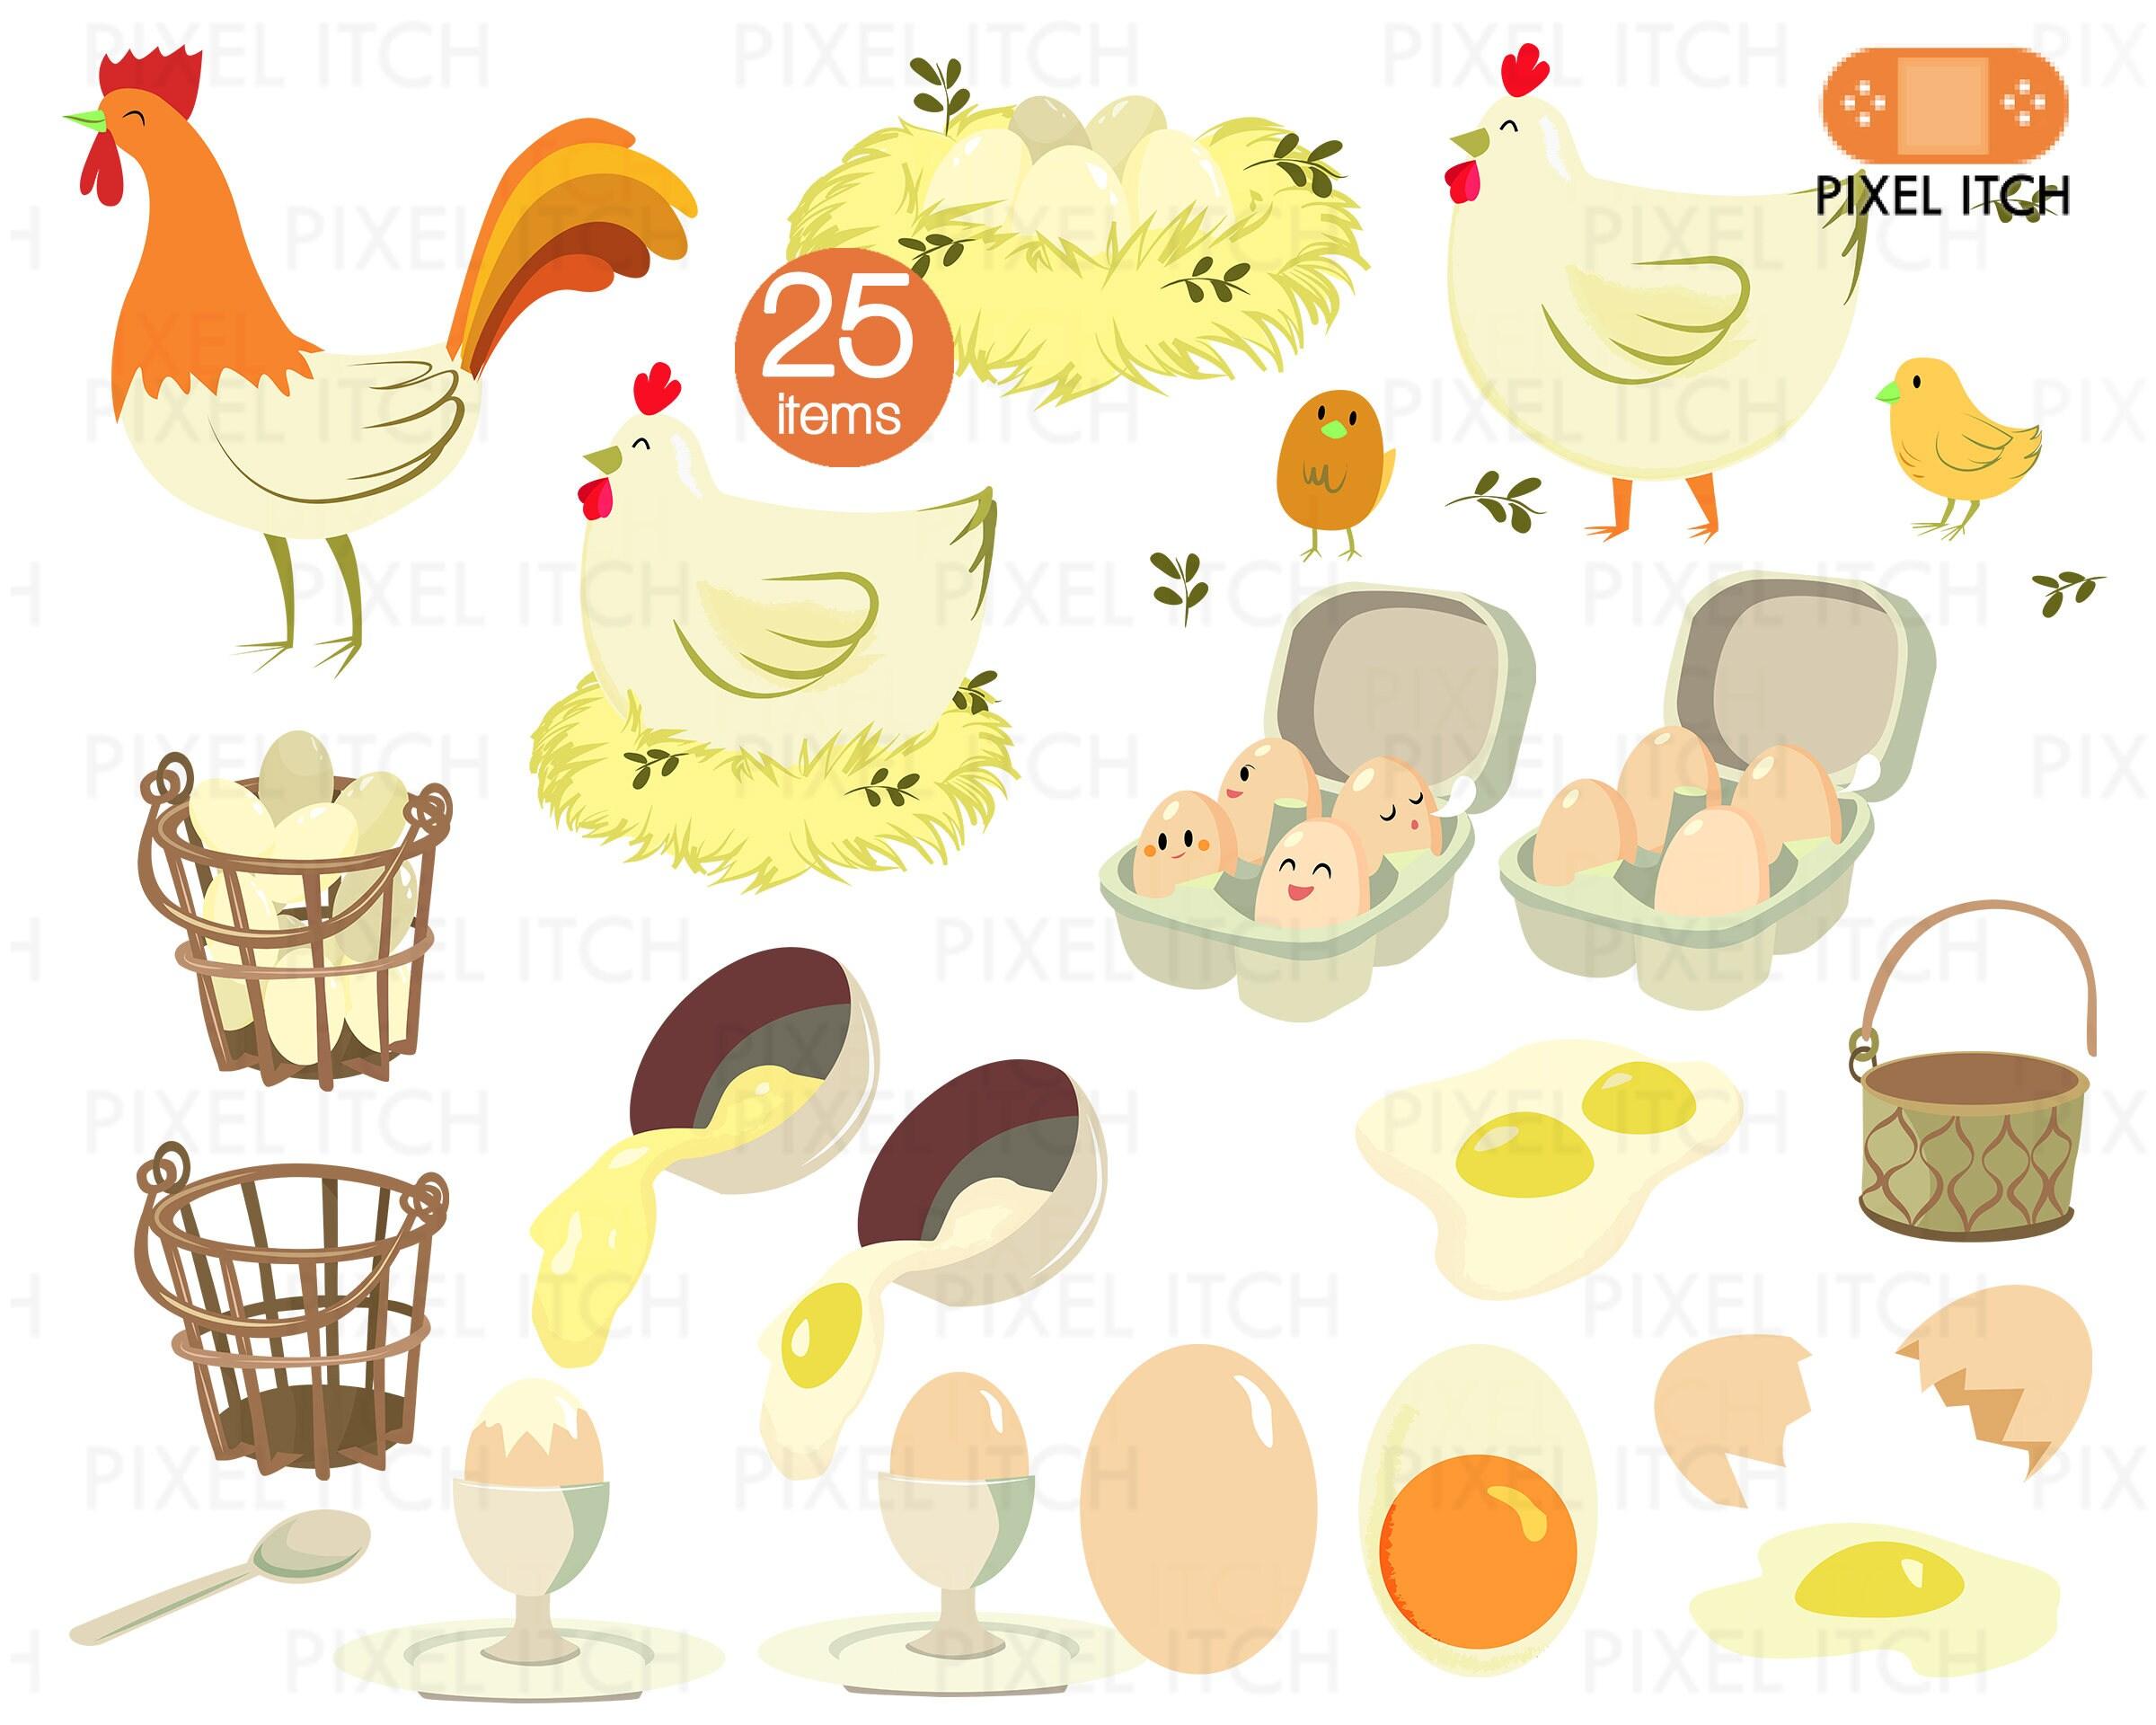 Poultry Clipart - Farm Clipart, Farm Produce, Chicken Clipart ...